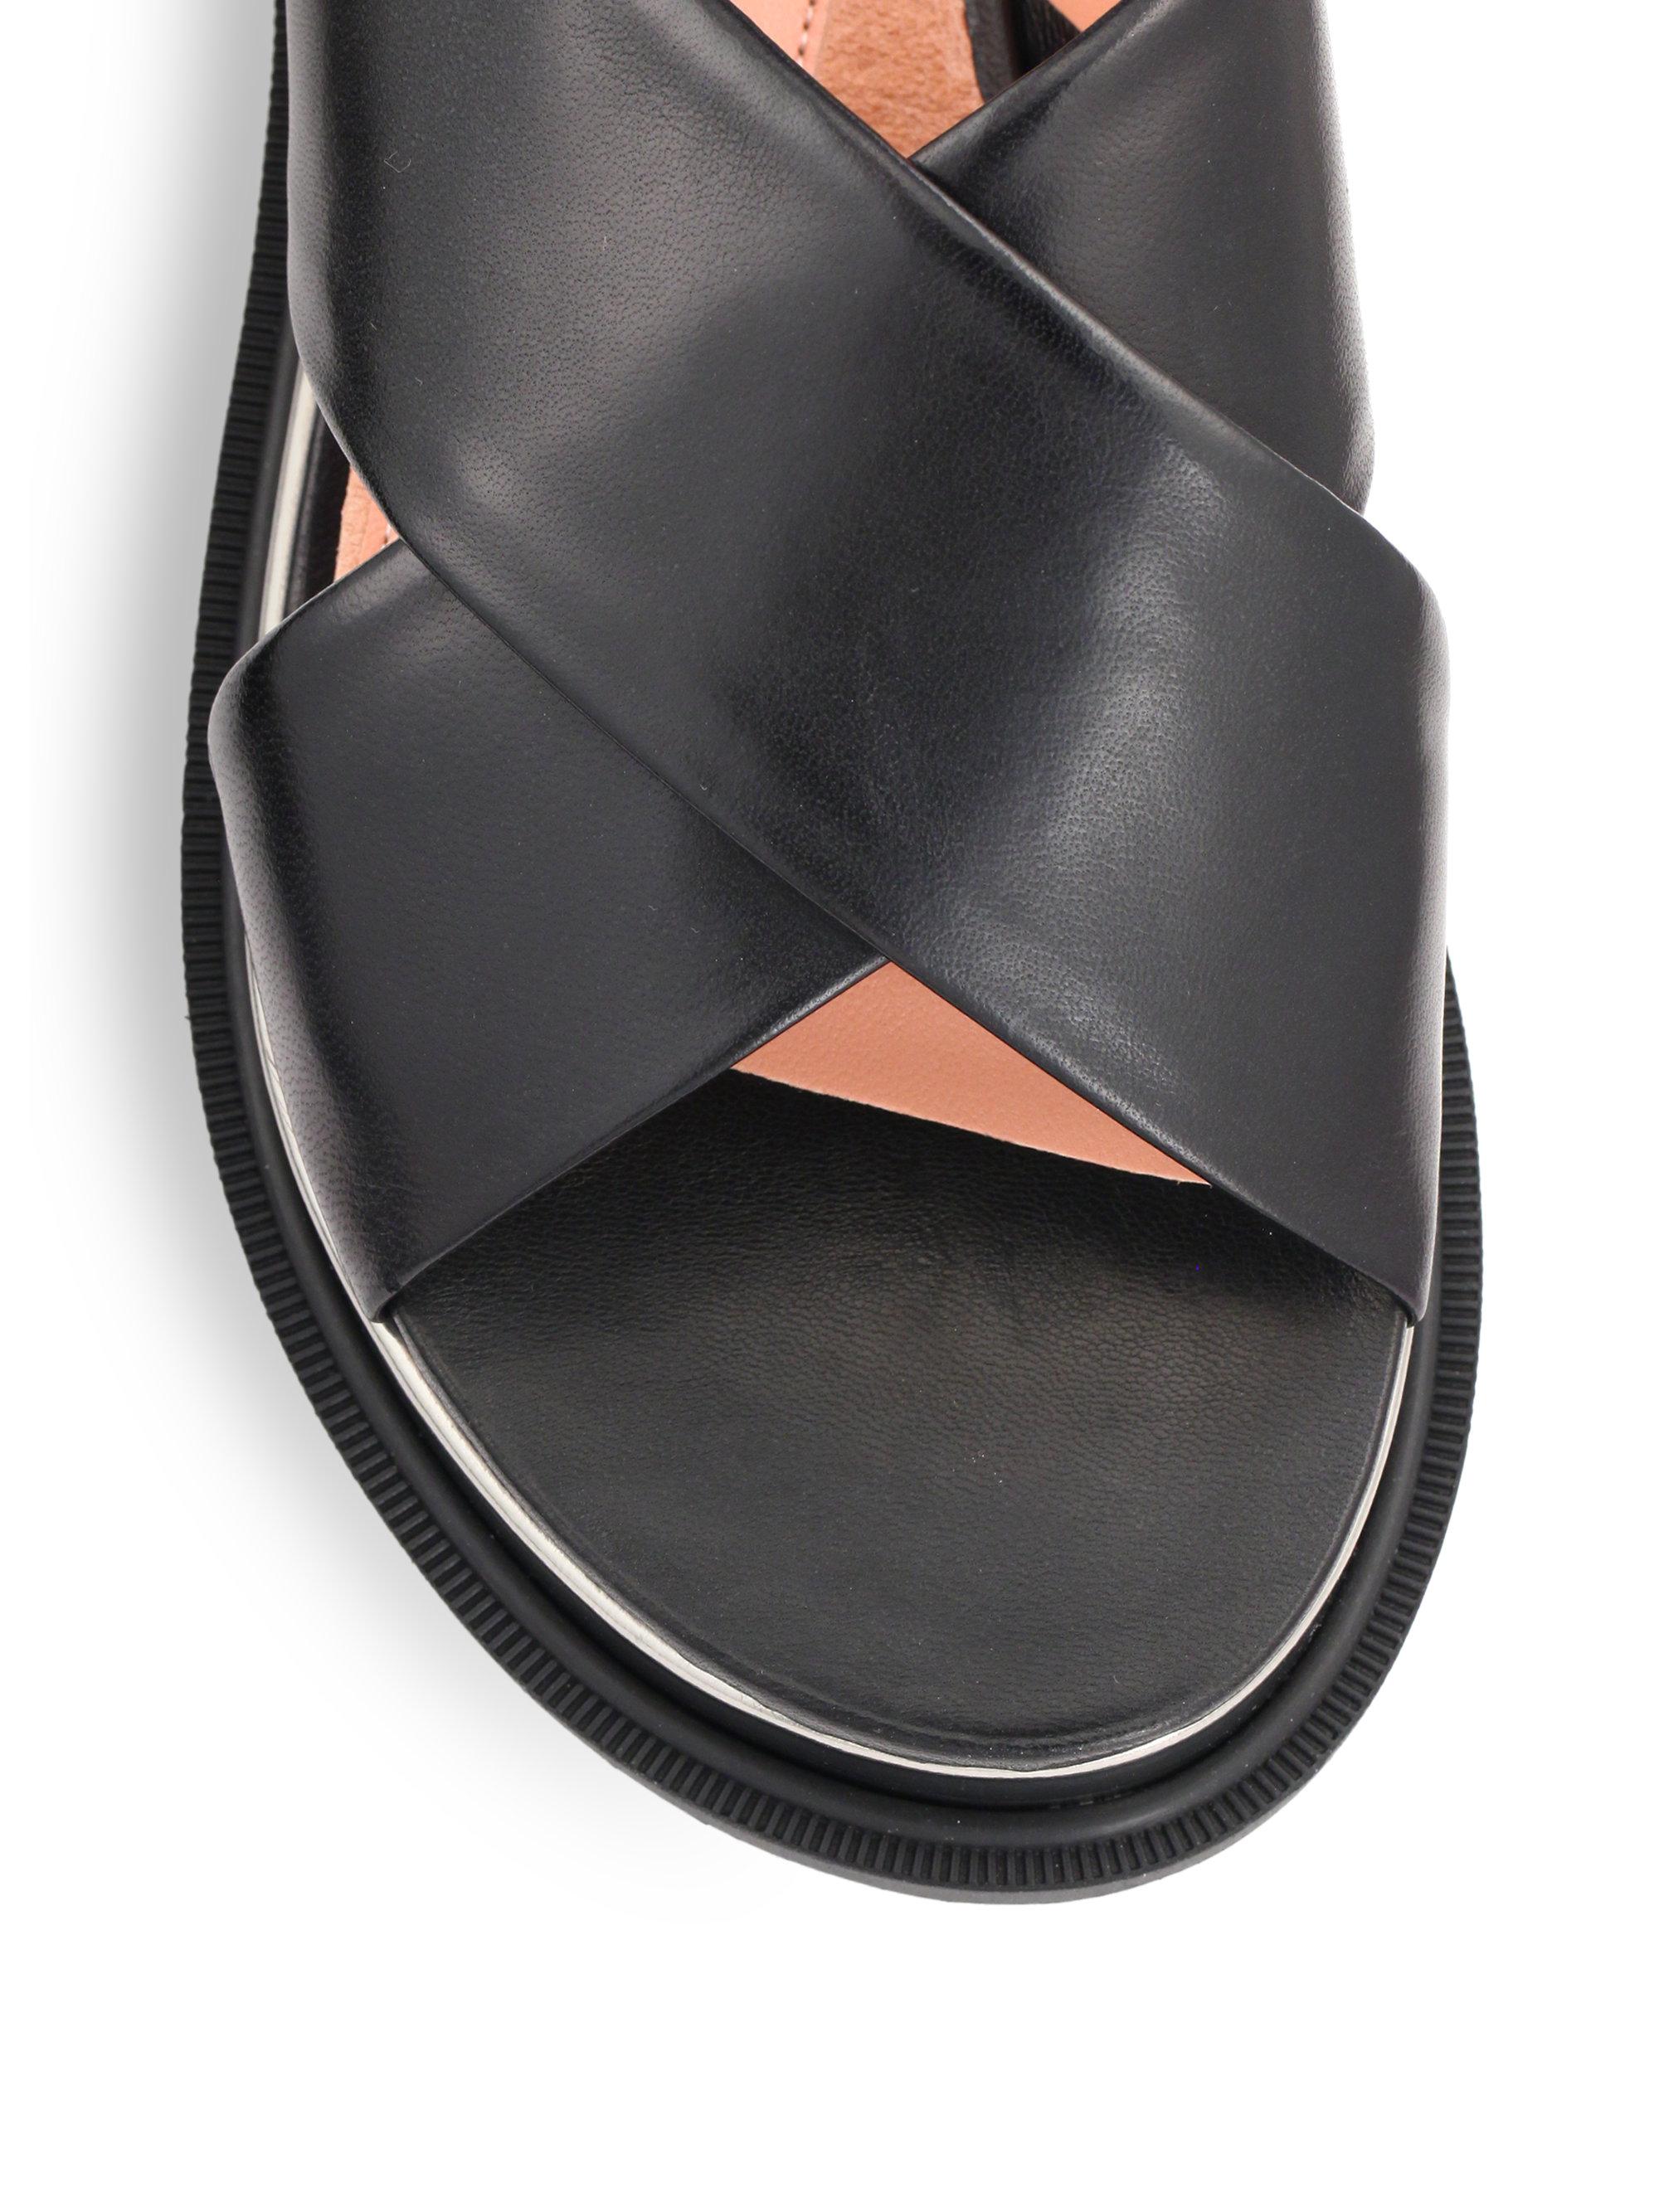 Robert Clergerie Caliba Crisscross Leather Sandals In